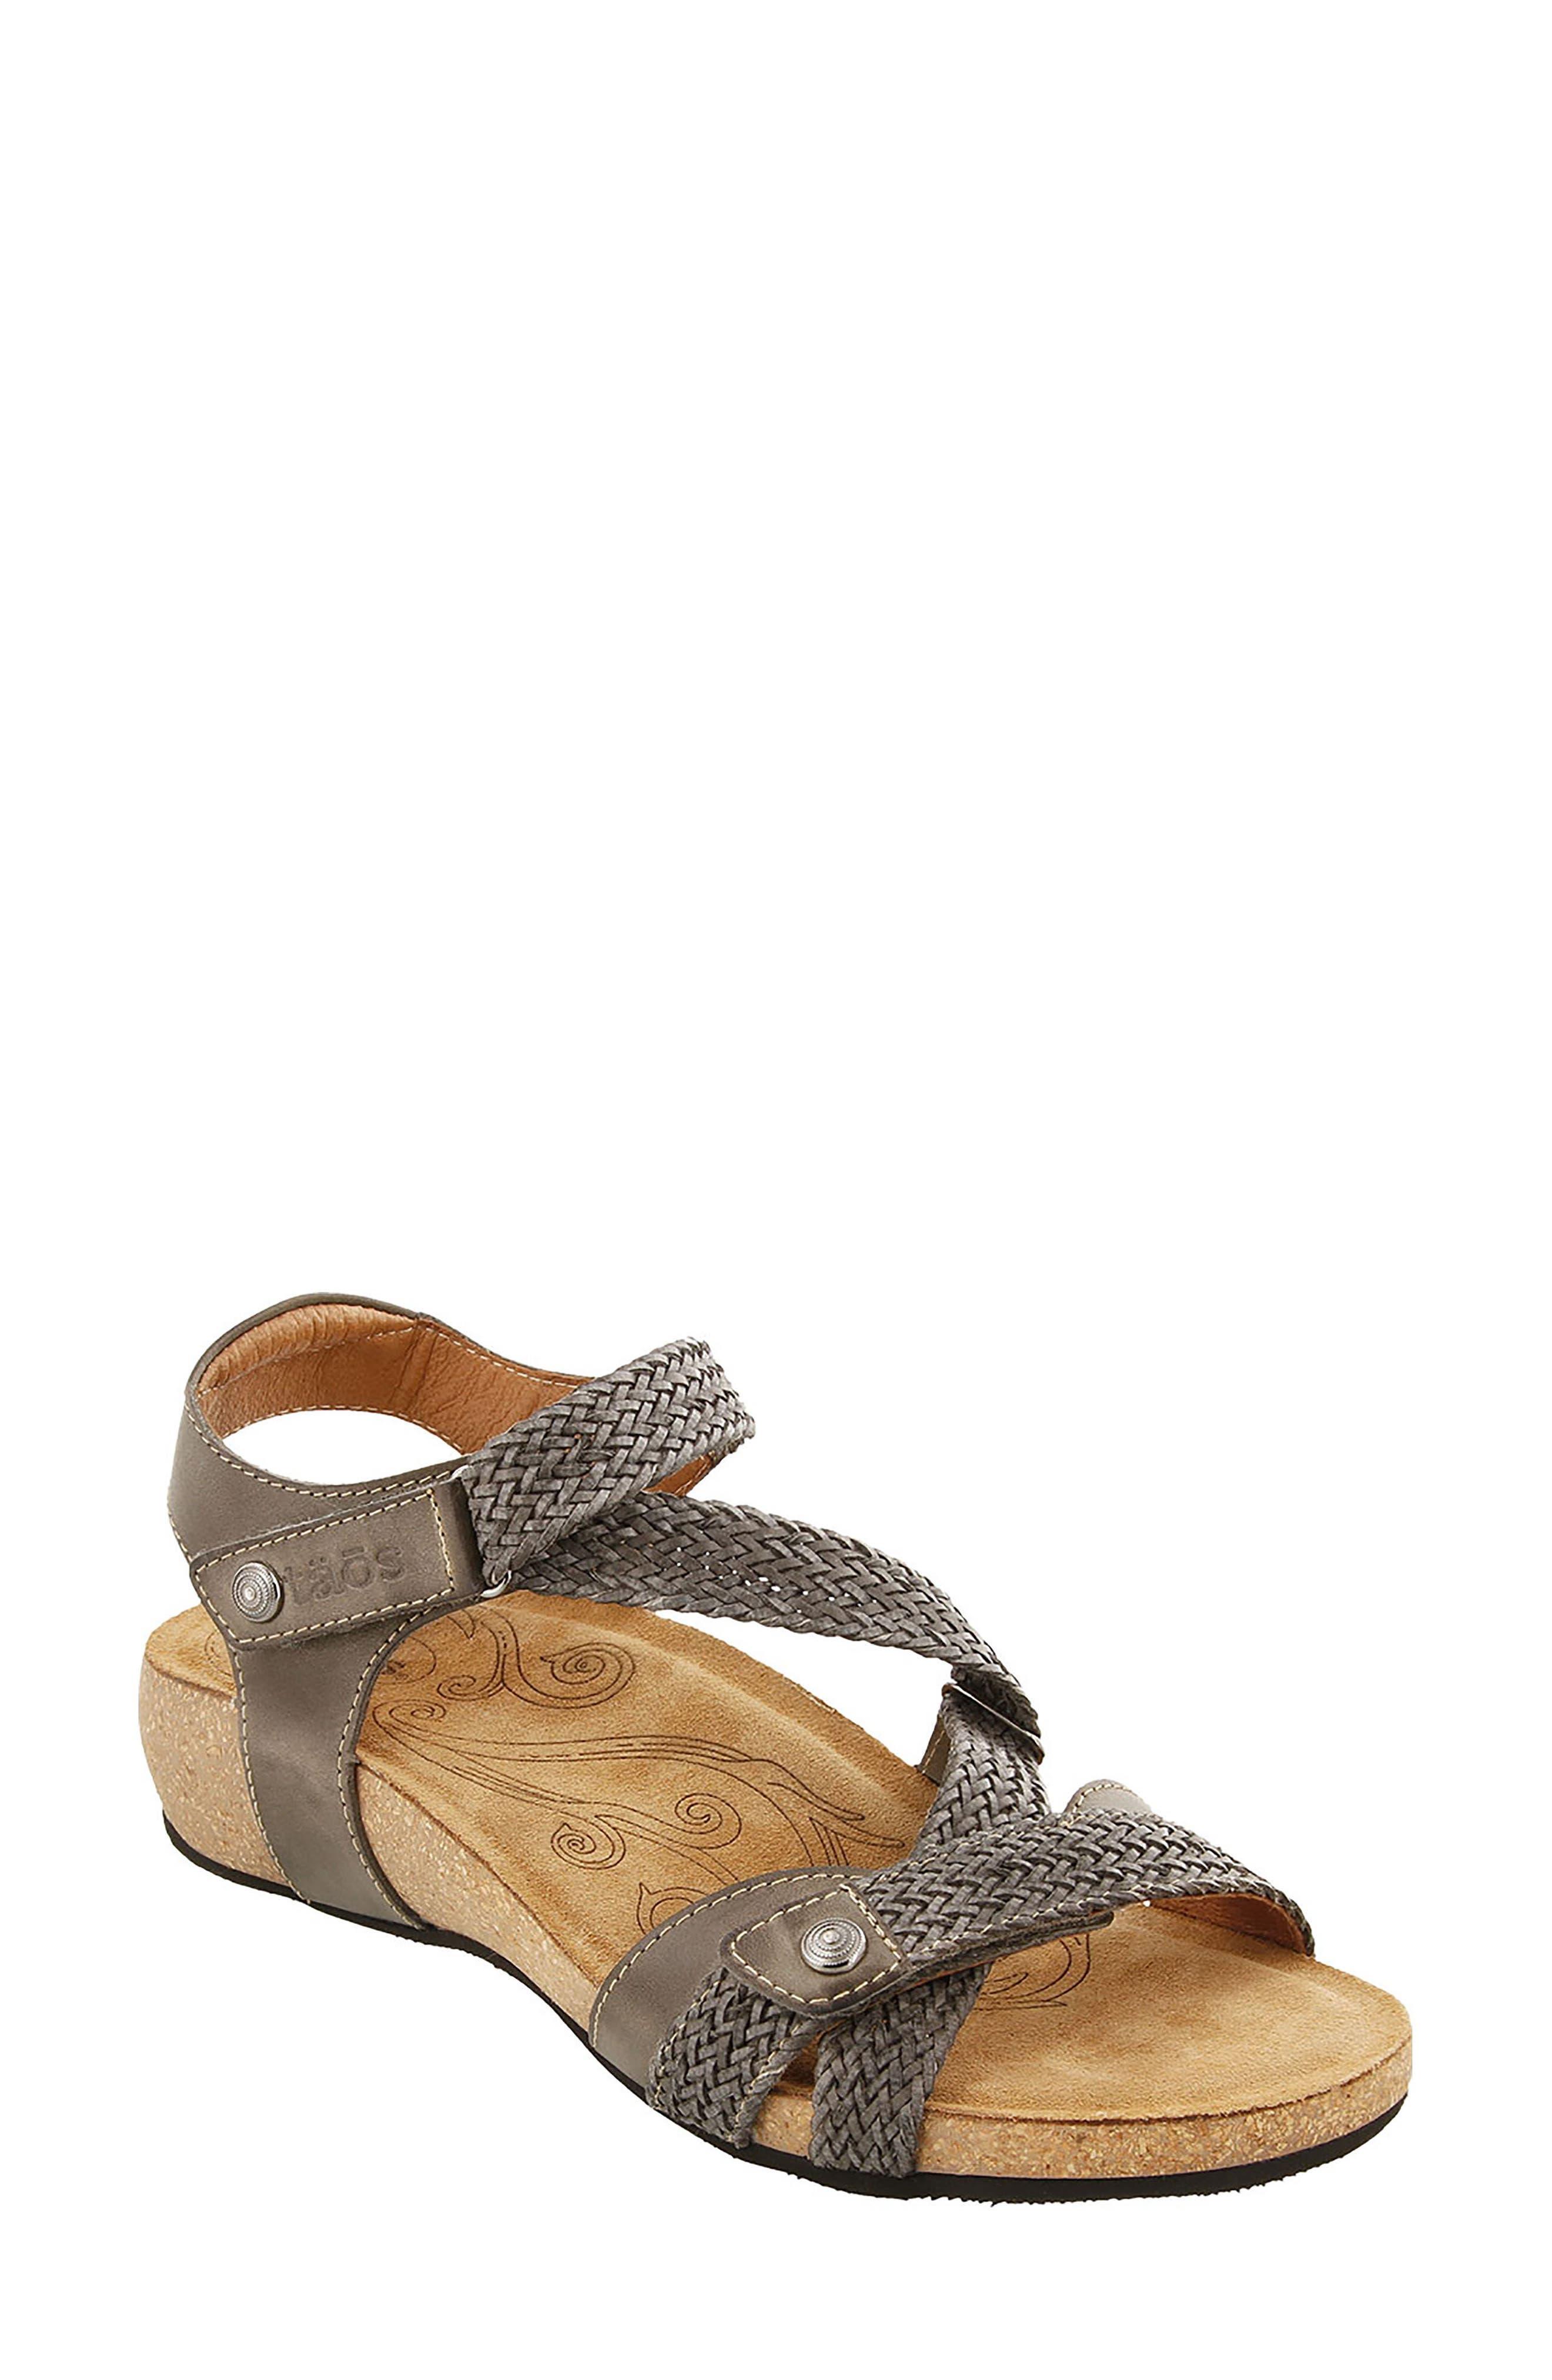 TAOS,                             'Trulie' Wedge Sandal,                             Main thumbnail 1, color,                             022